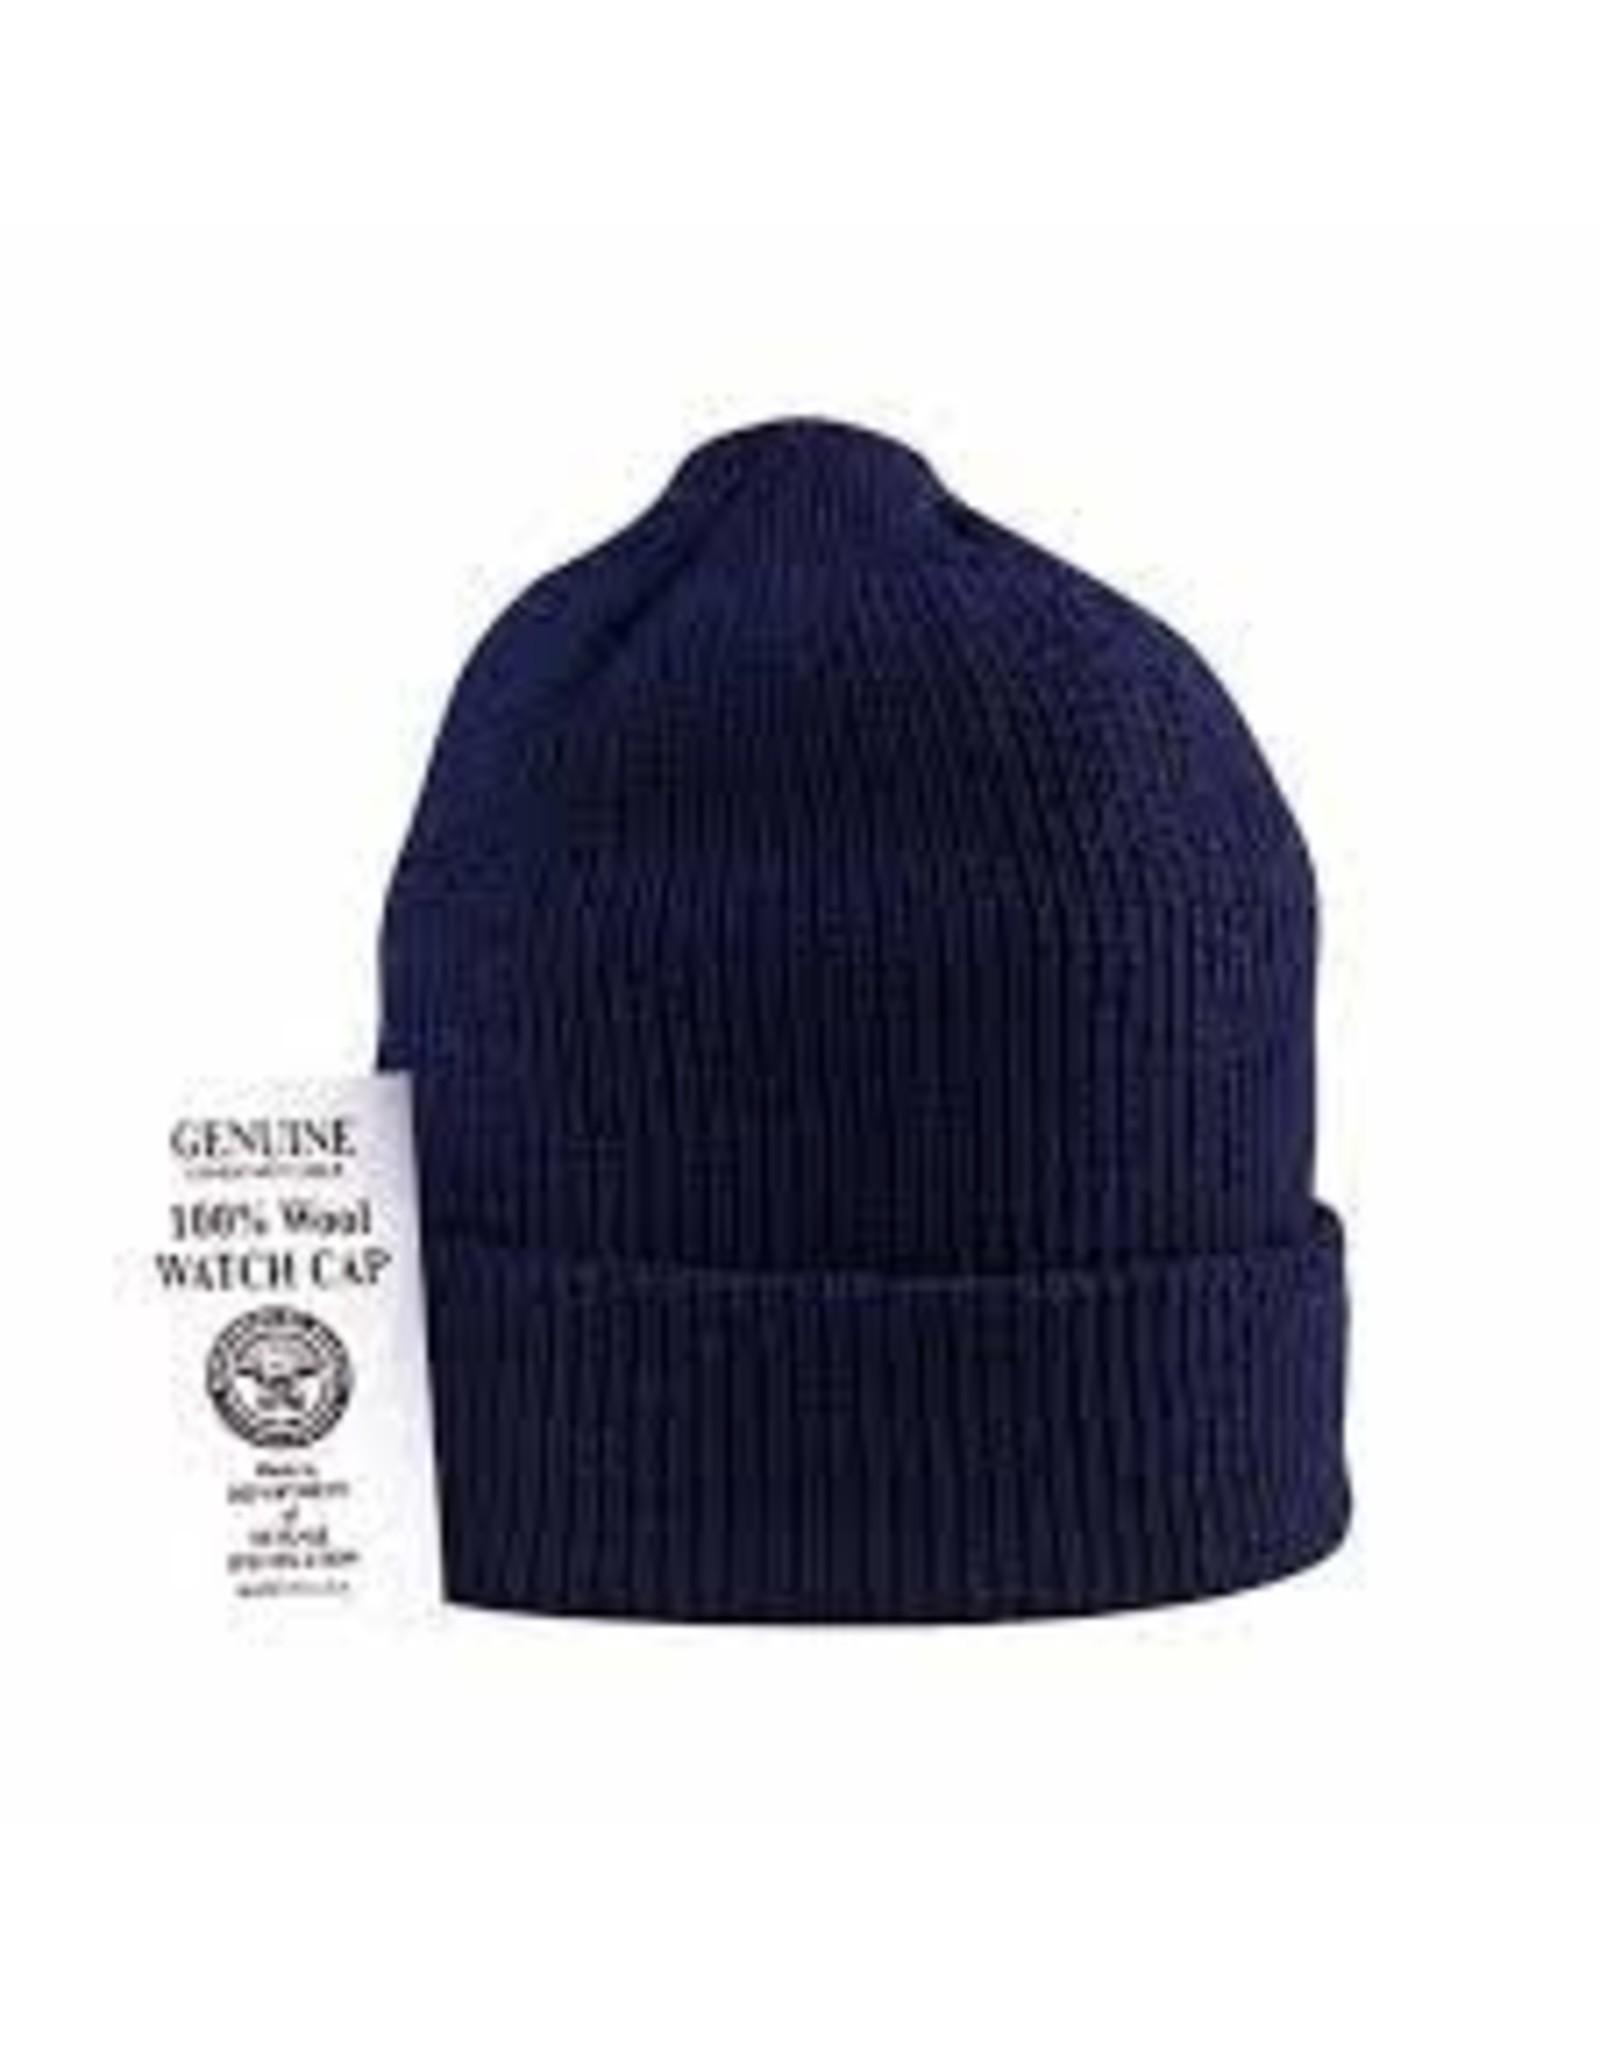 ROTHCO 100% WOOL WATCH CAP